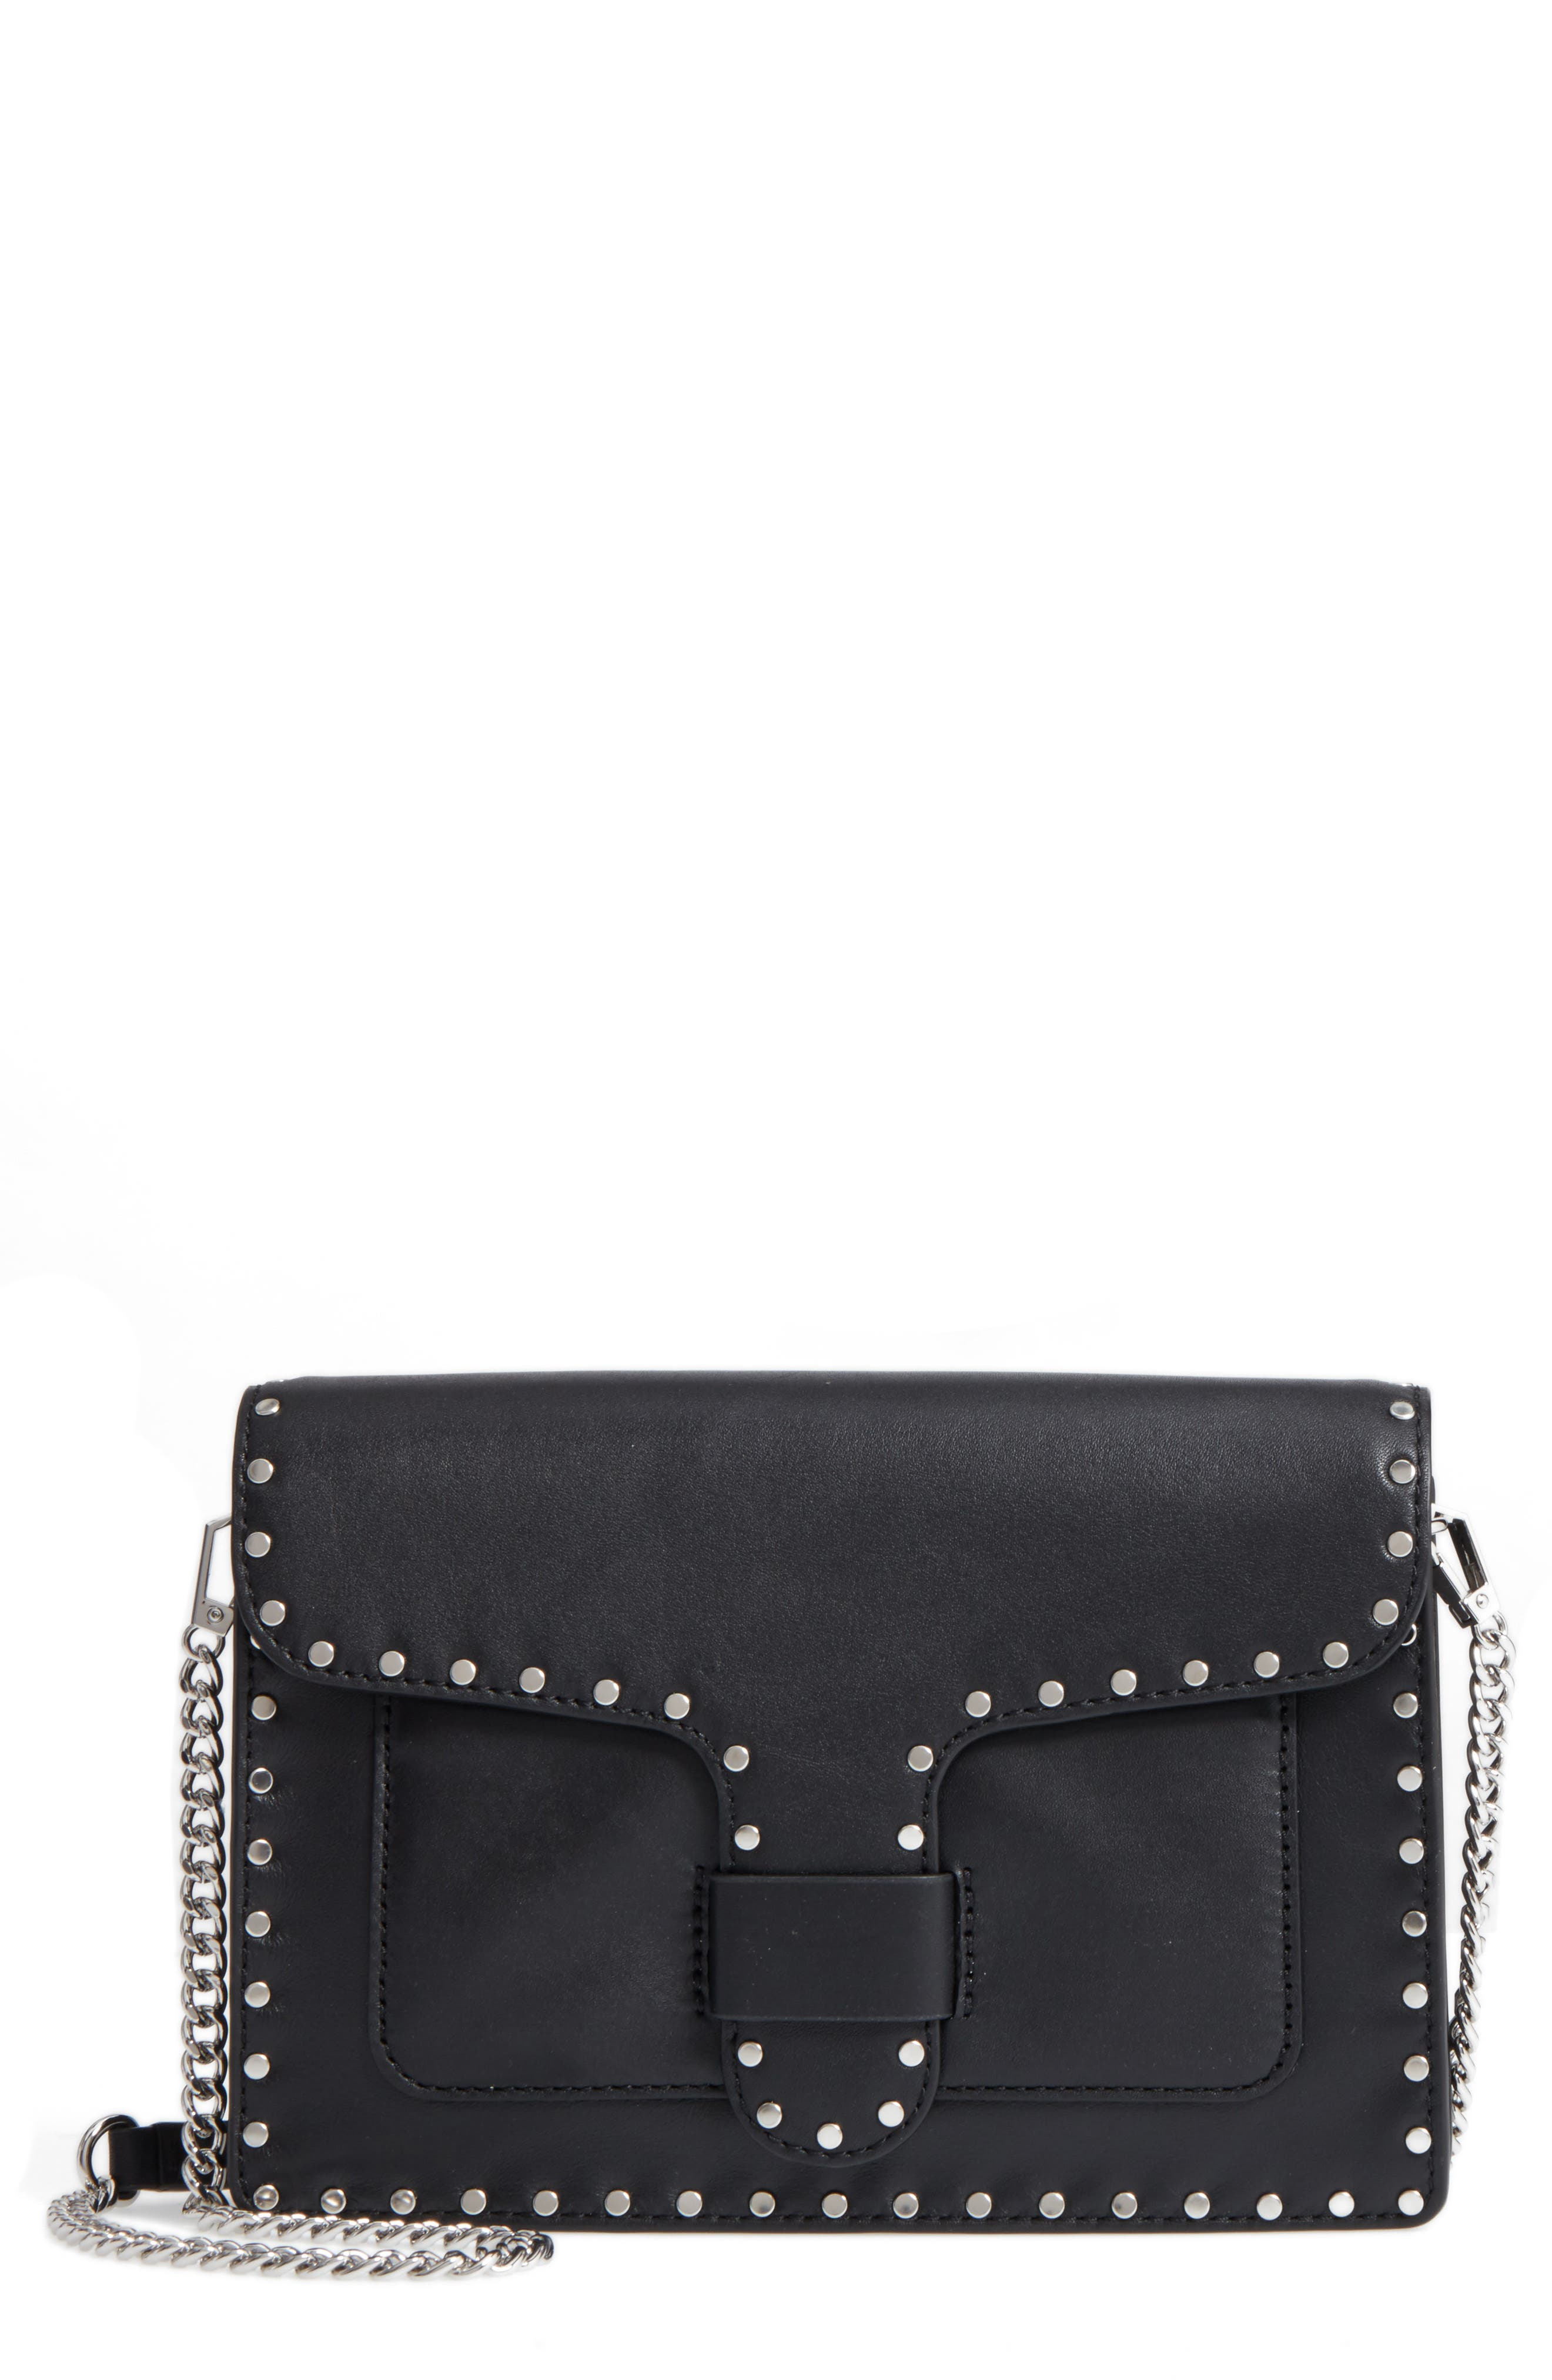 Medium Midnighter Leather Crossbody Bag,                             Main thumbnail 1, color,                             001